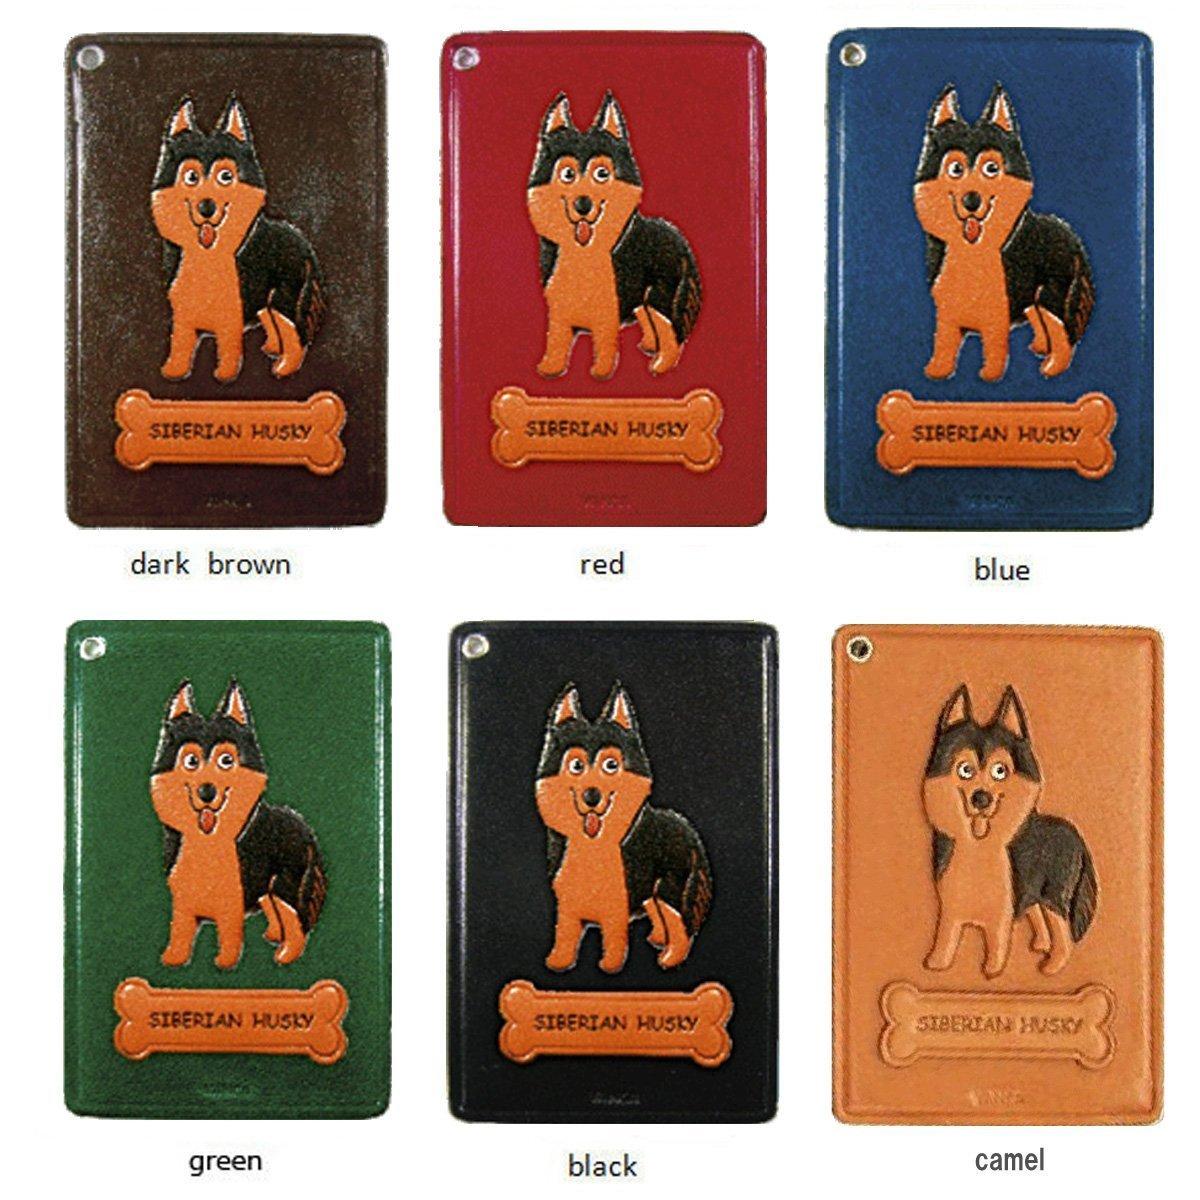 Siberian Husky Leather Dog Pass/ID/Credit/Card Holder/CaseVANCA Handmade in Japan